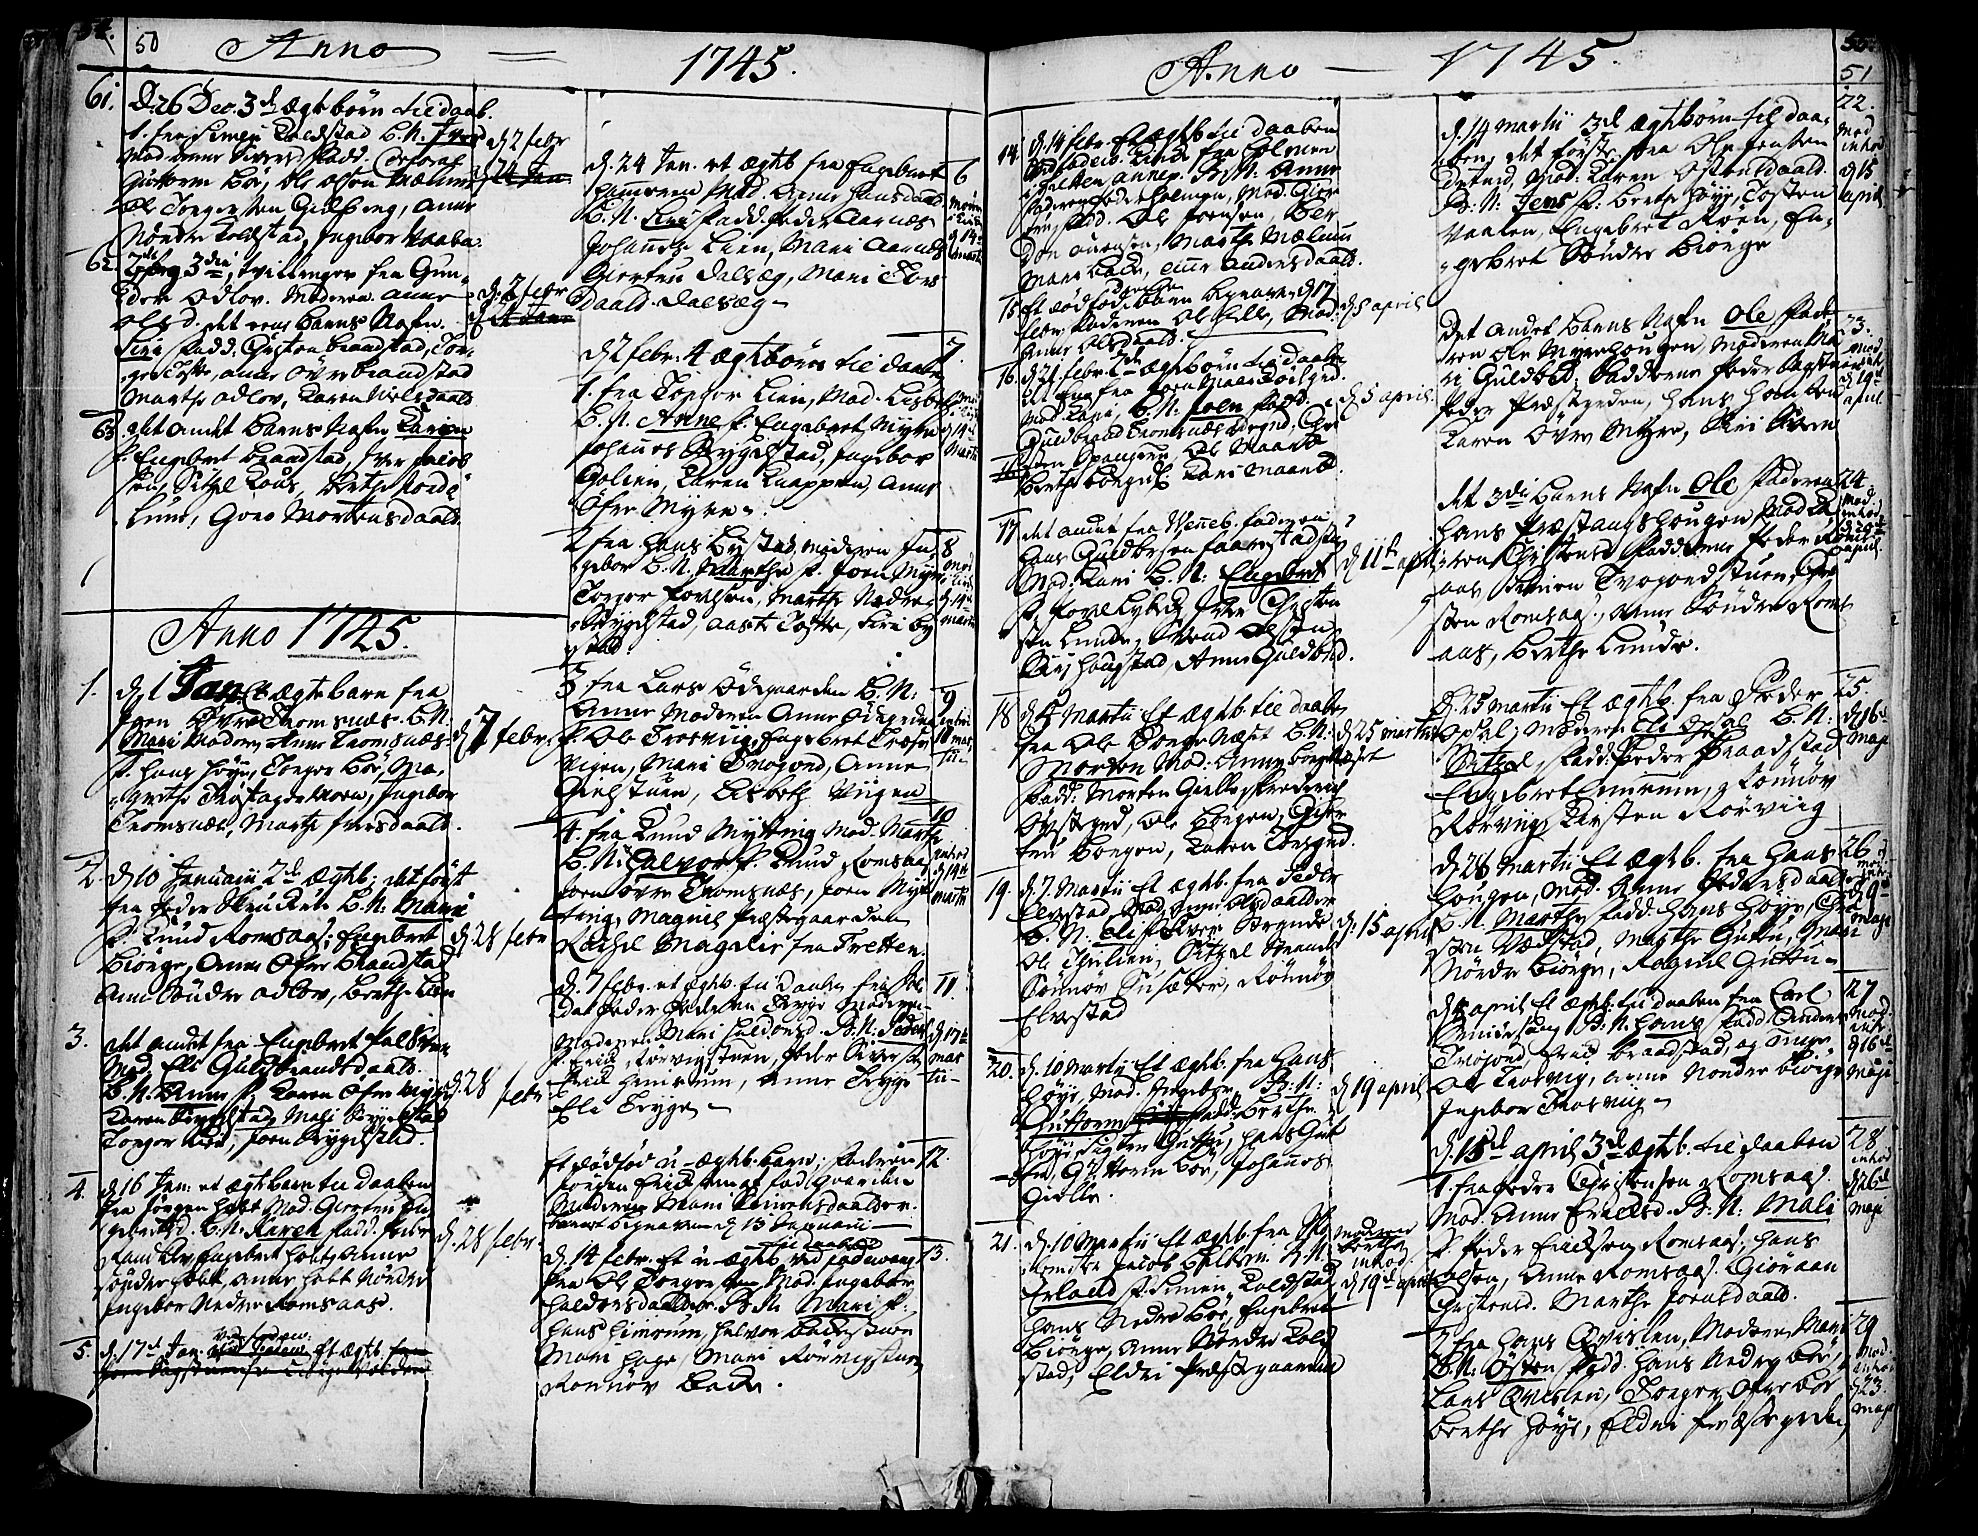 SAH, Ringebu prestekontor, Ministerialbok nr. 2, 1734-1780, s. 50-51